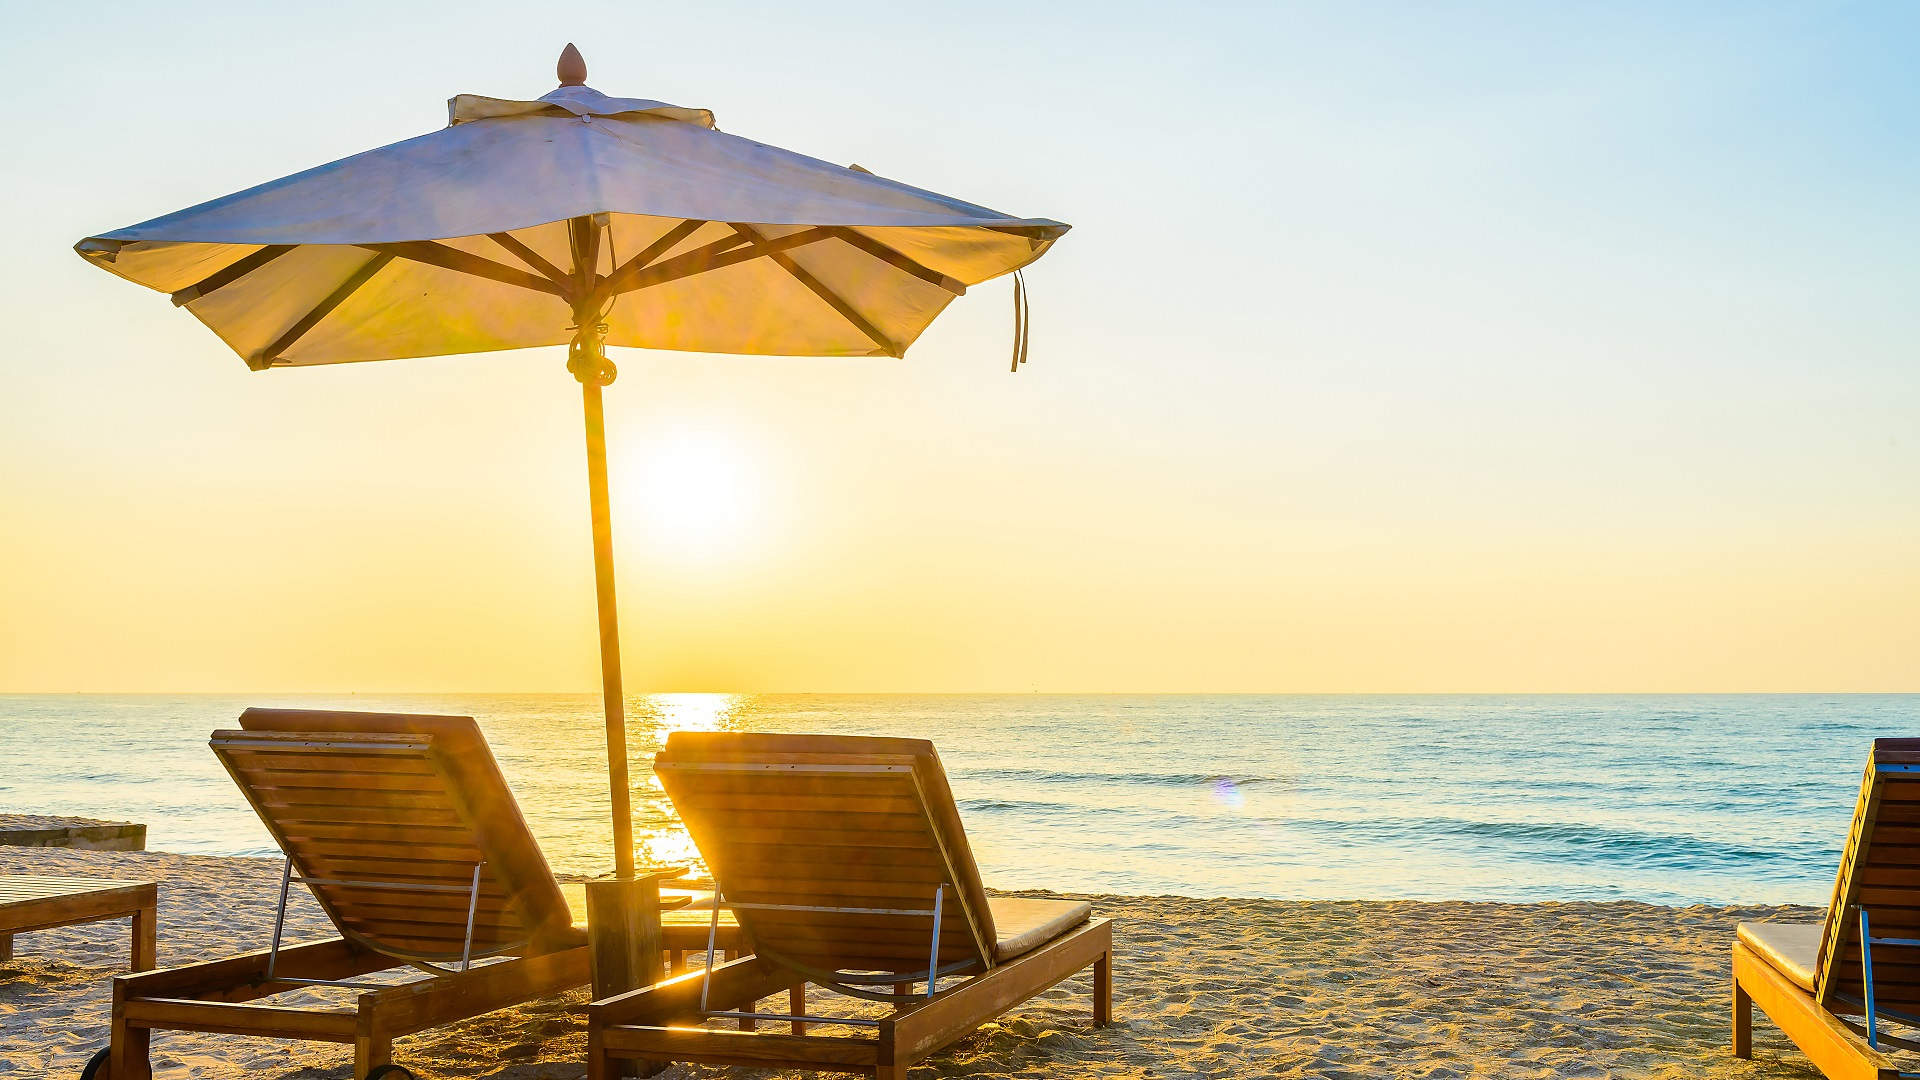 Strandbed met ondergaande zon